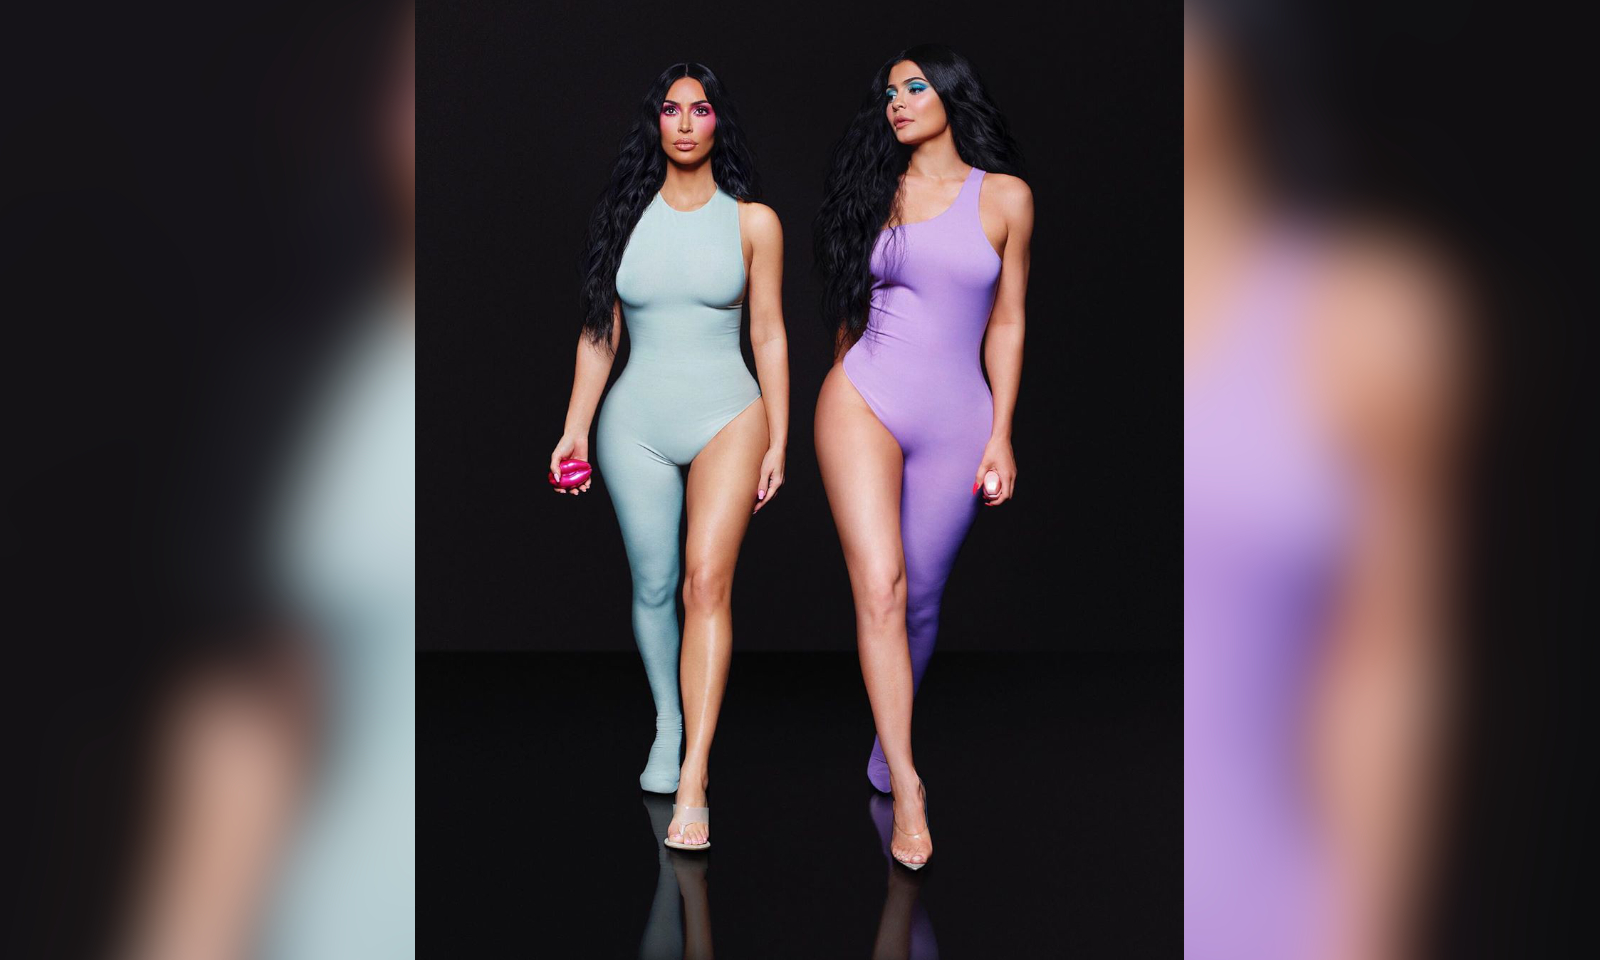 Kim Kardashian Has Six Toes In Photoshop Blunder